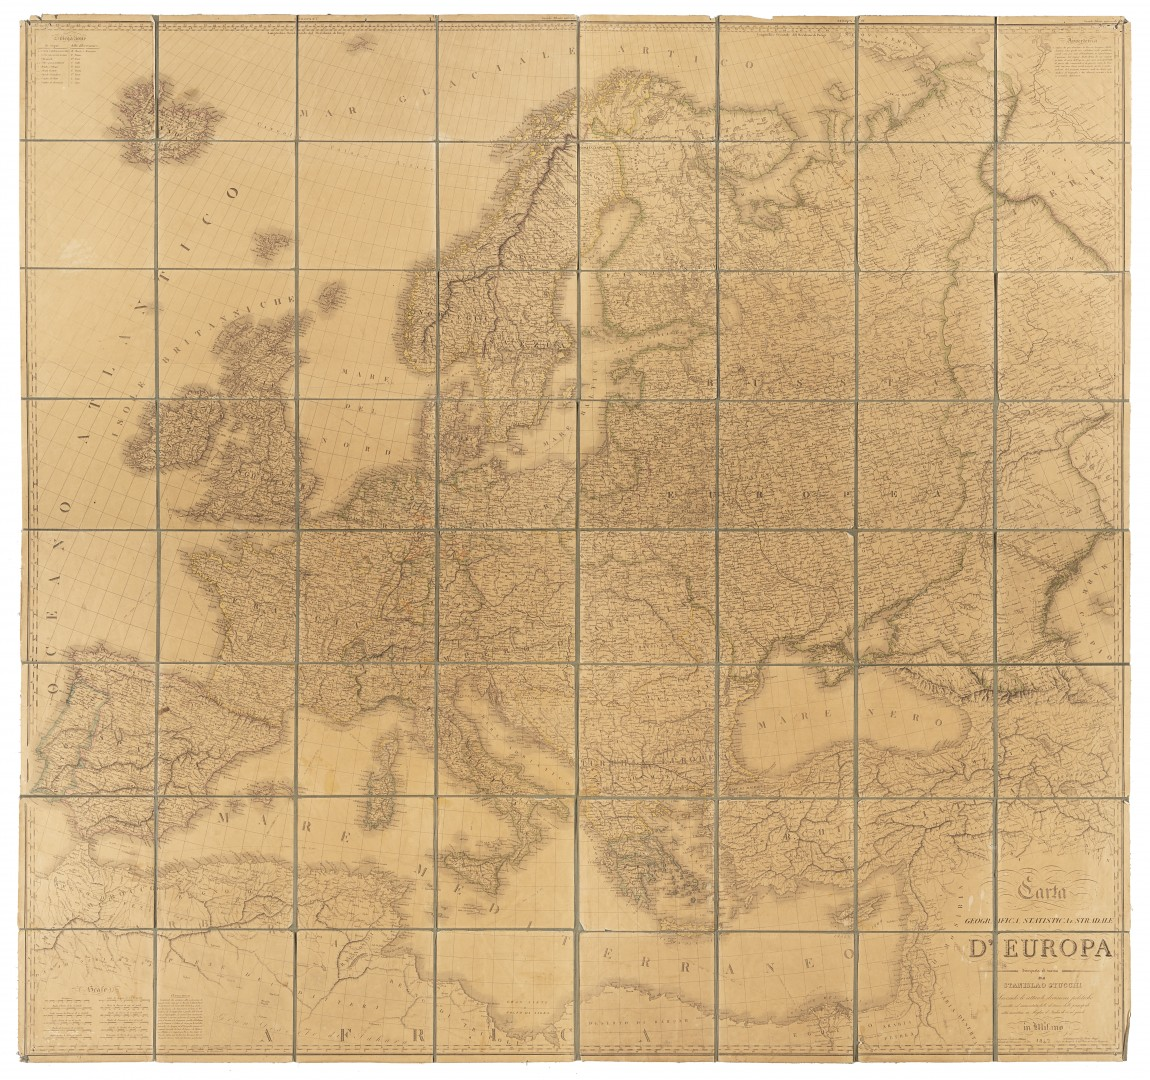 Stucchi, Stanislao Carta geografica statistica e stradale d'Europa.